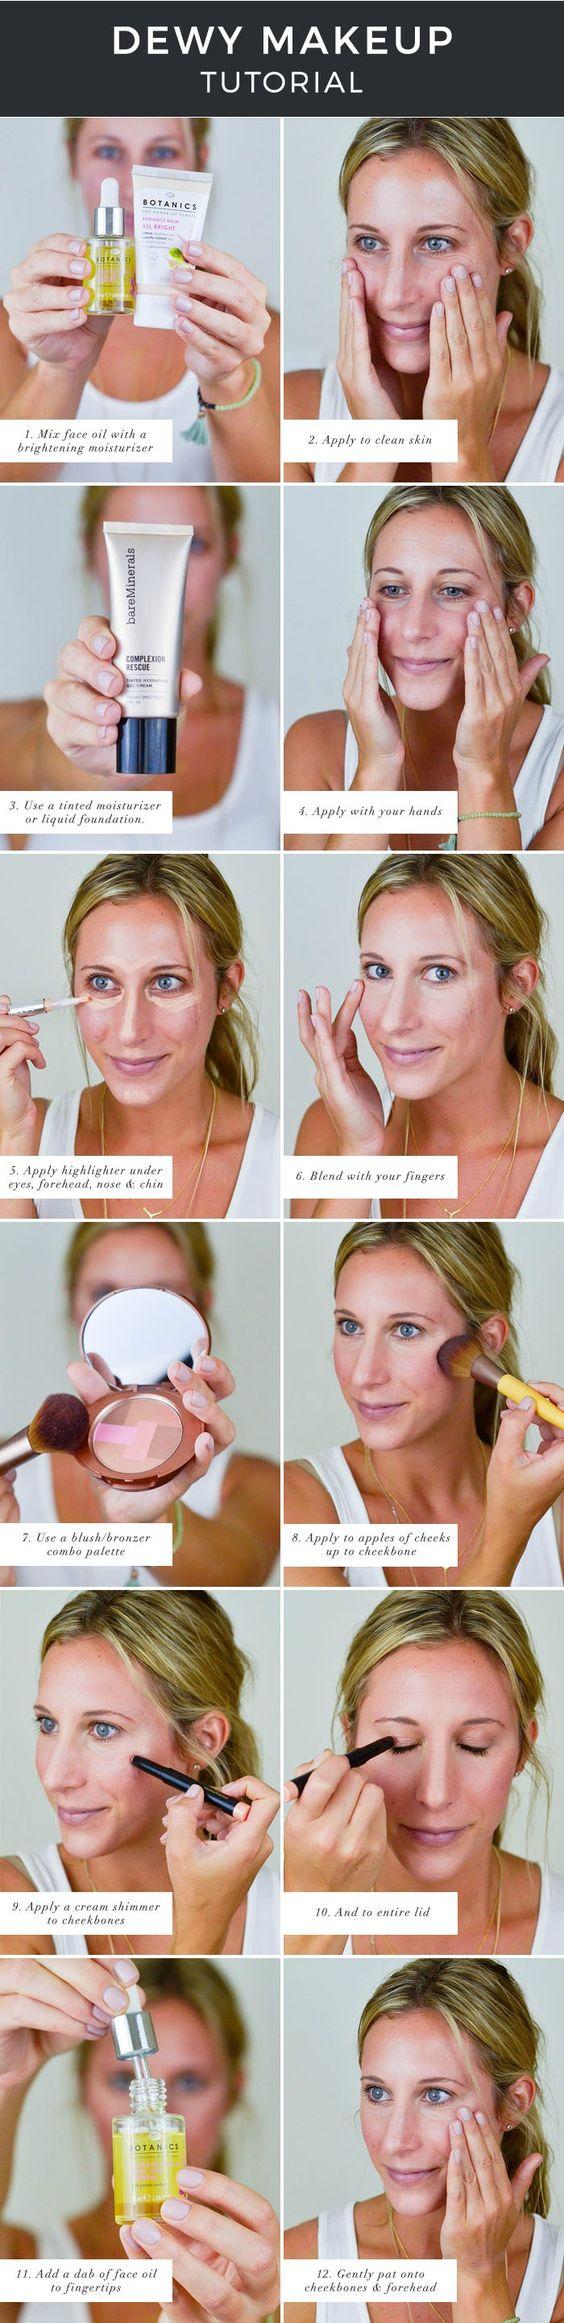 How to get that dewy makeup look with @Walgreens! #WalgreensBeauty, makeup tutorial, beauty